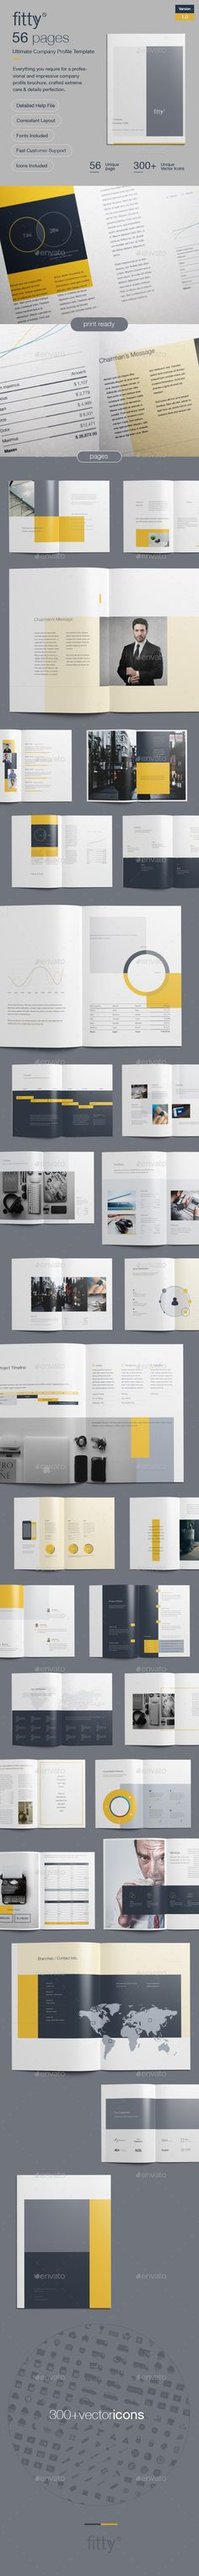 Pinterest u2022 The worldu0027s catalog of ideas - company profile format